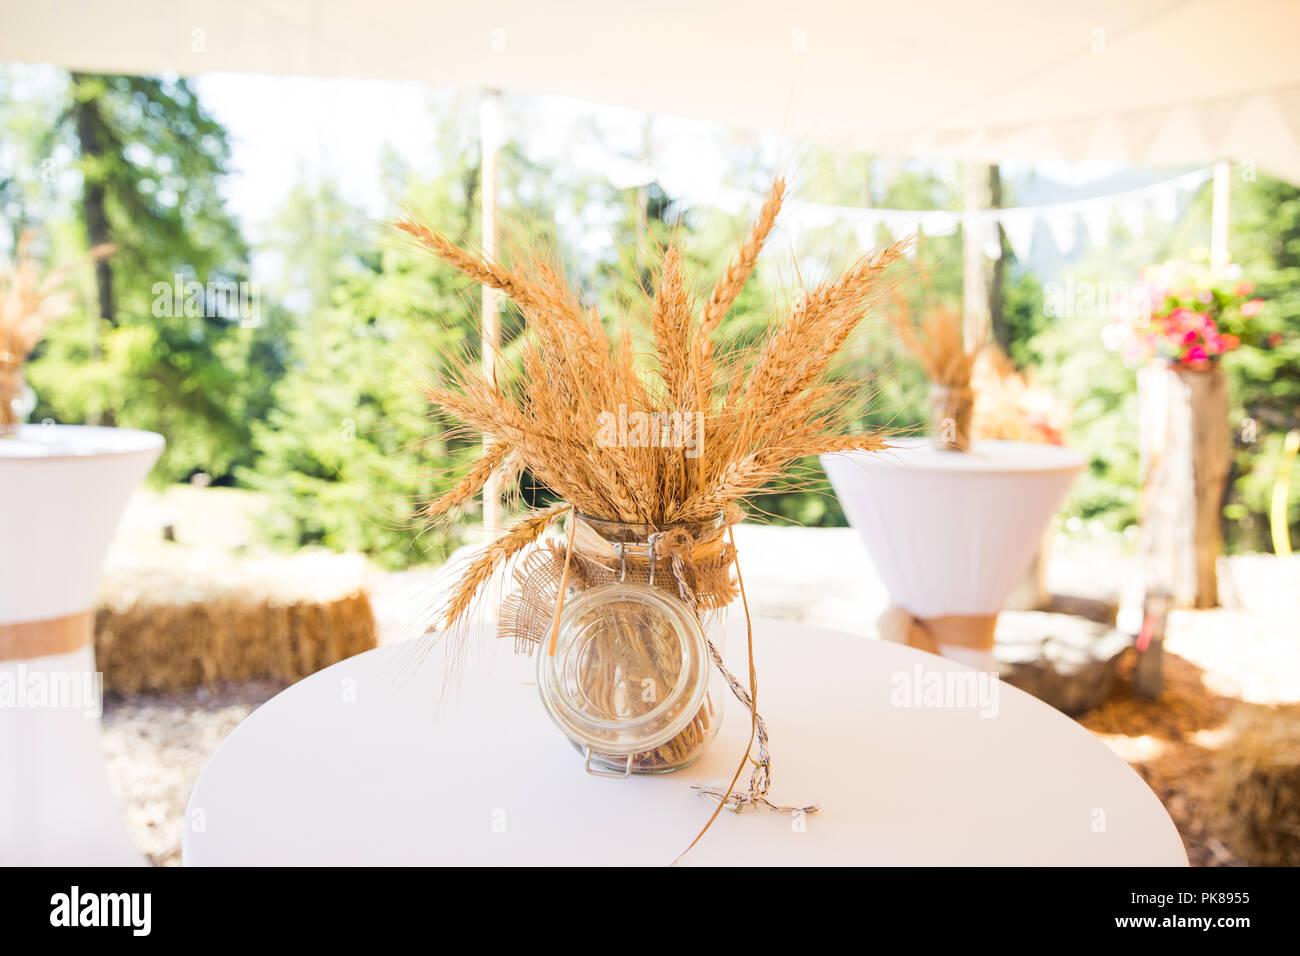 Getrocknet Weizen Ohren In Glas Sparen Jar In Shabby Chic Rustikale